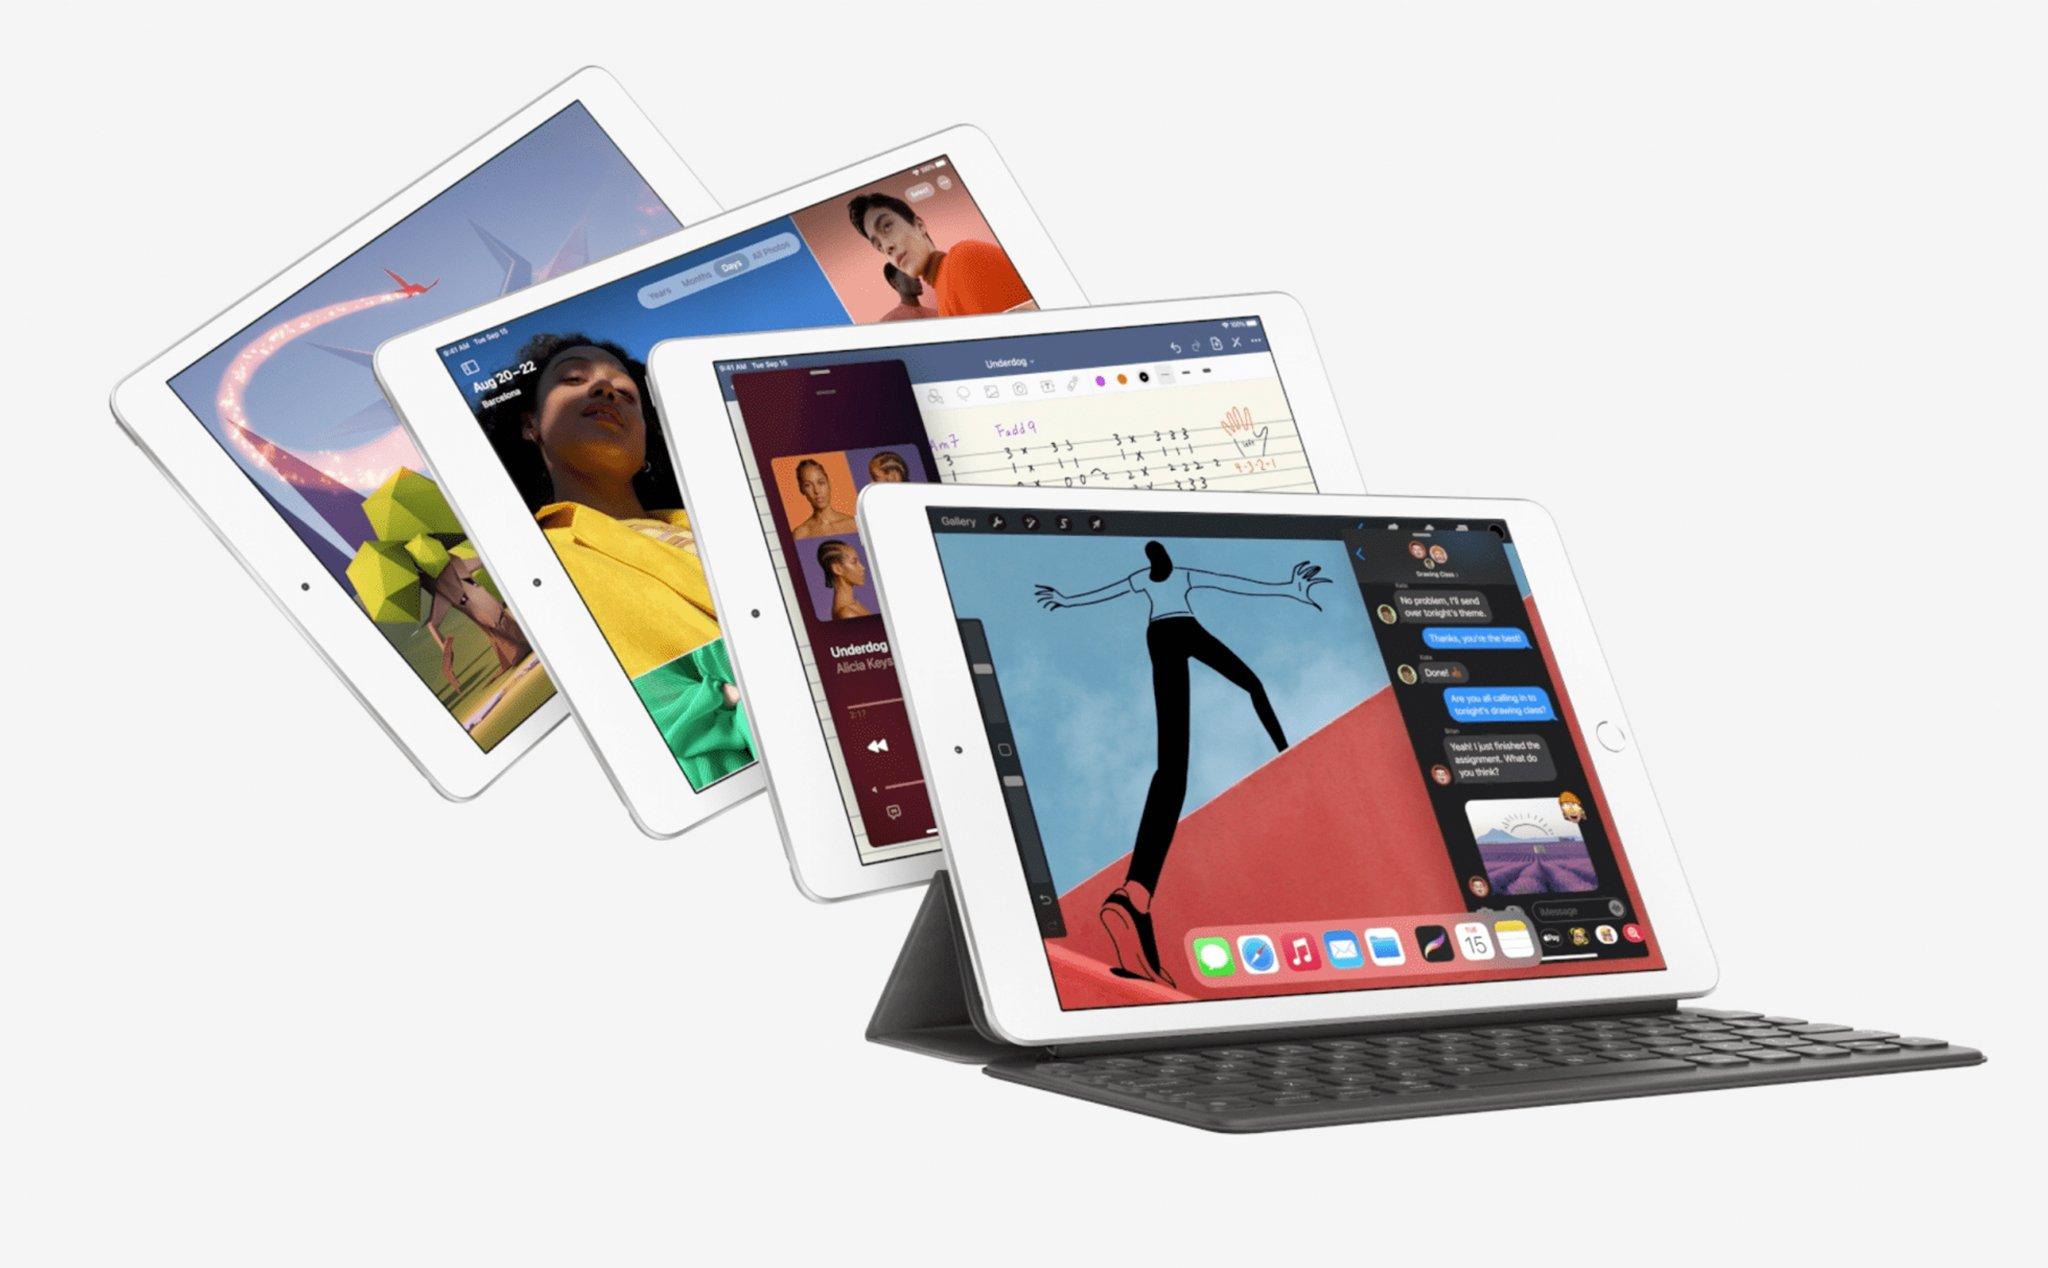 Apple iPad gen 8: thiết kế cũ, A12 Bionic, giá từ 329 USD